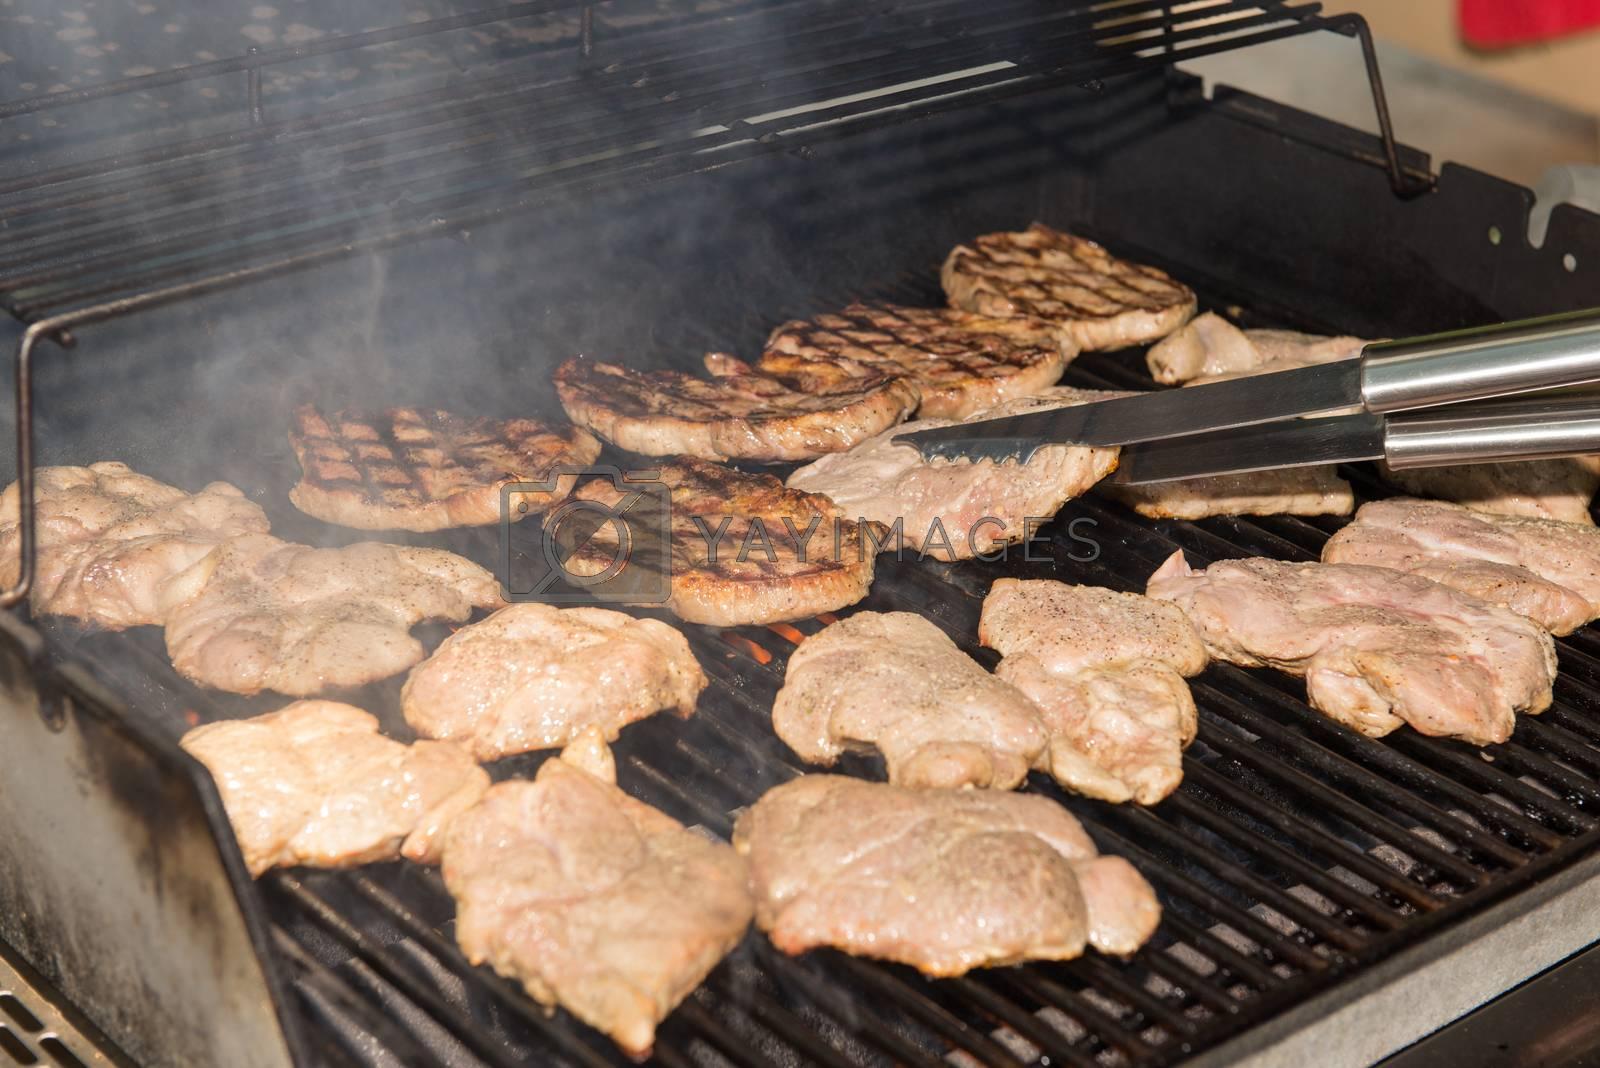 Grilling pork steaks by Dan Totilca